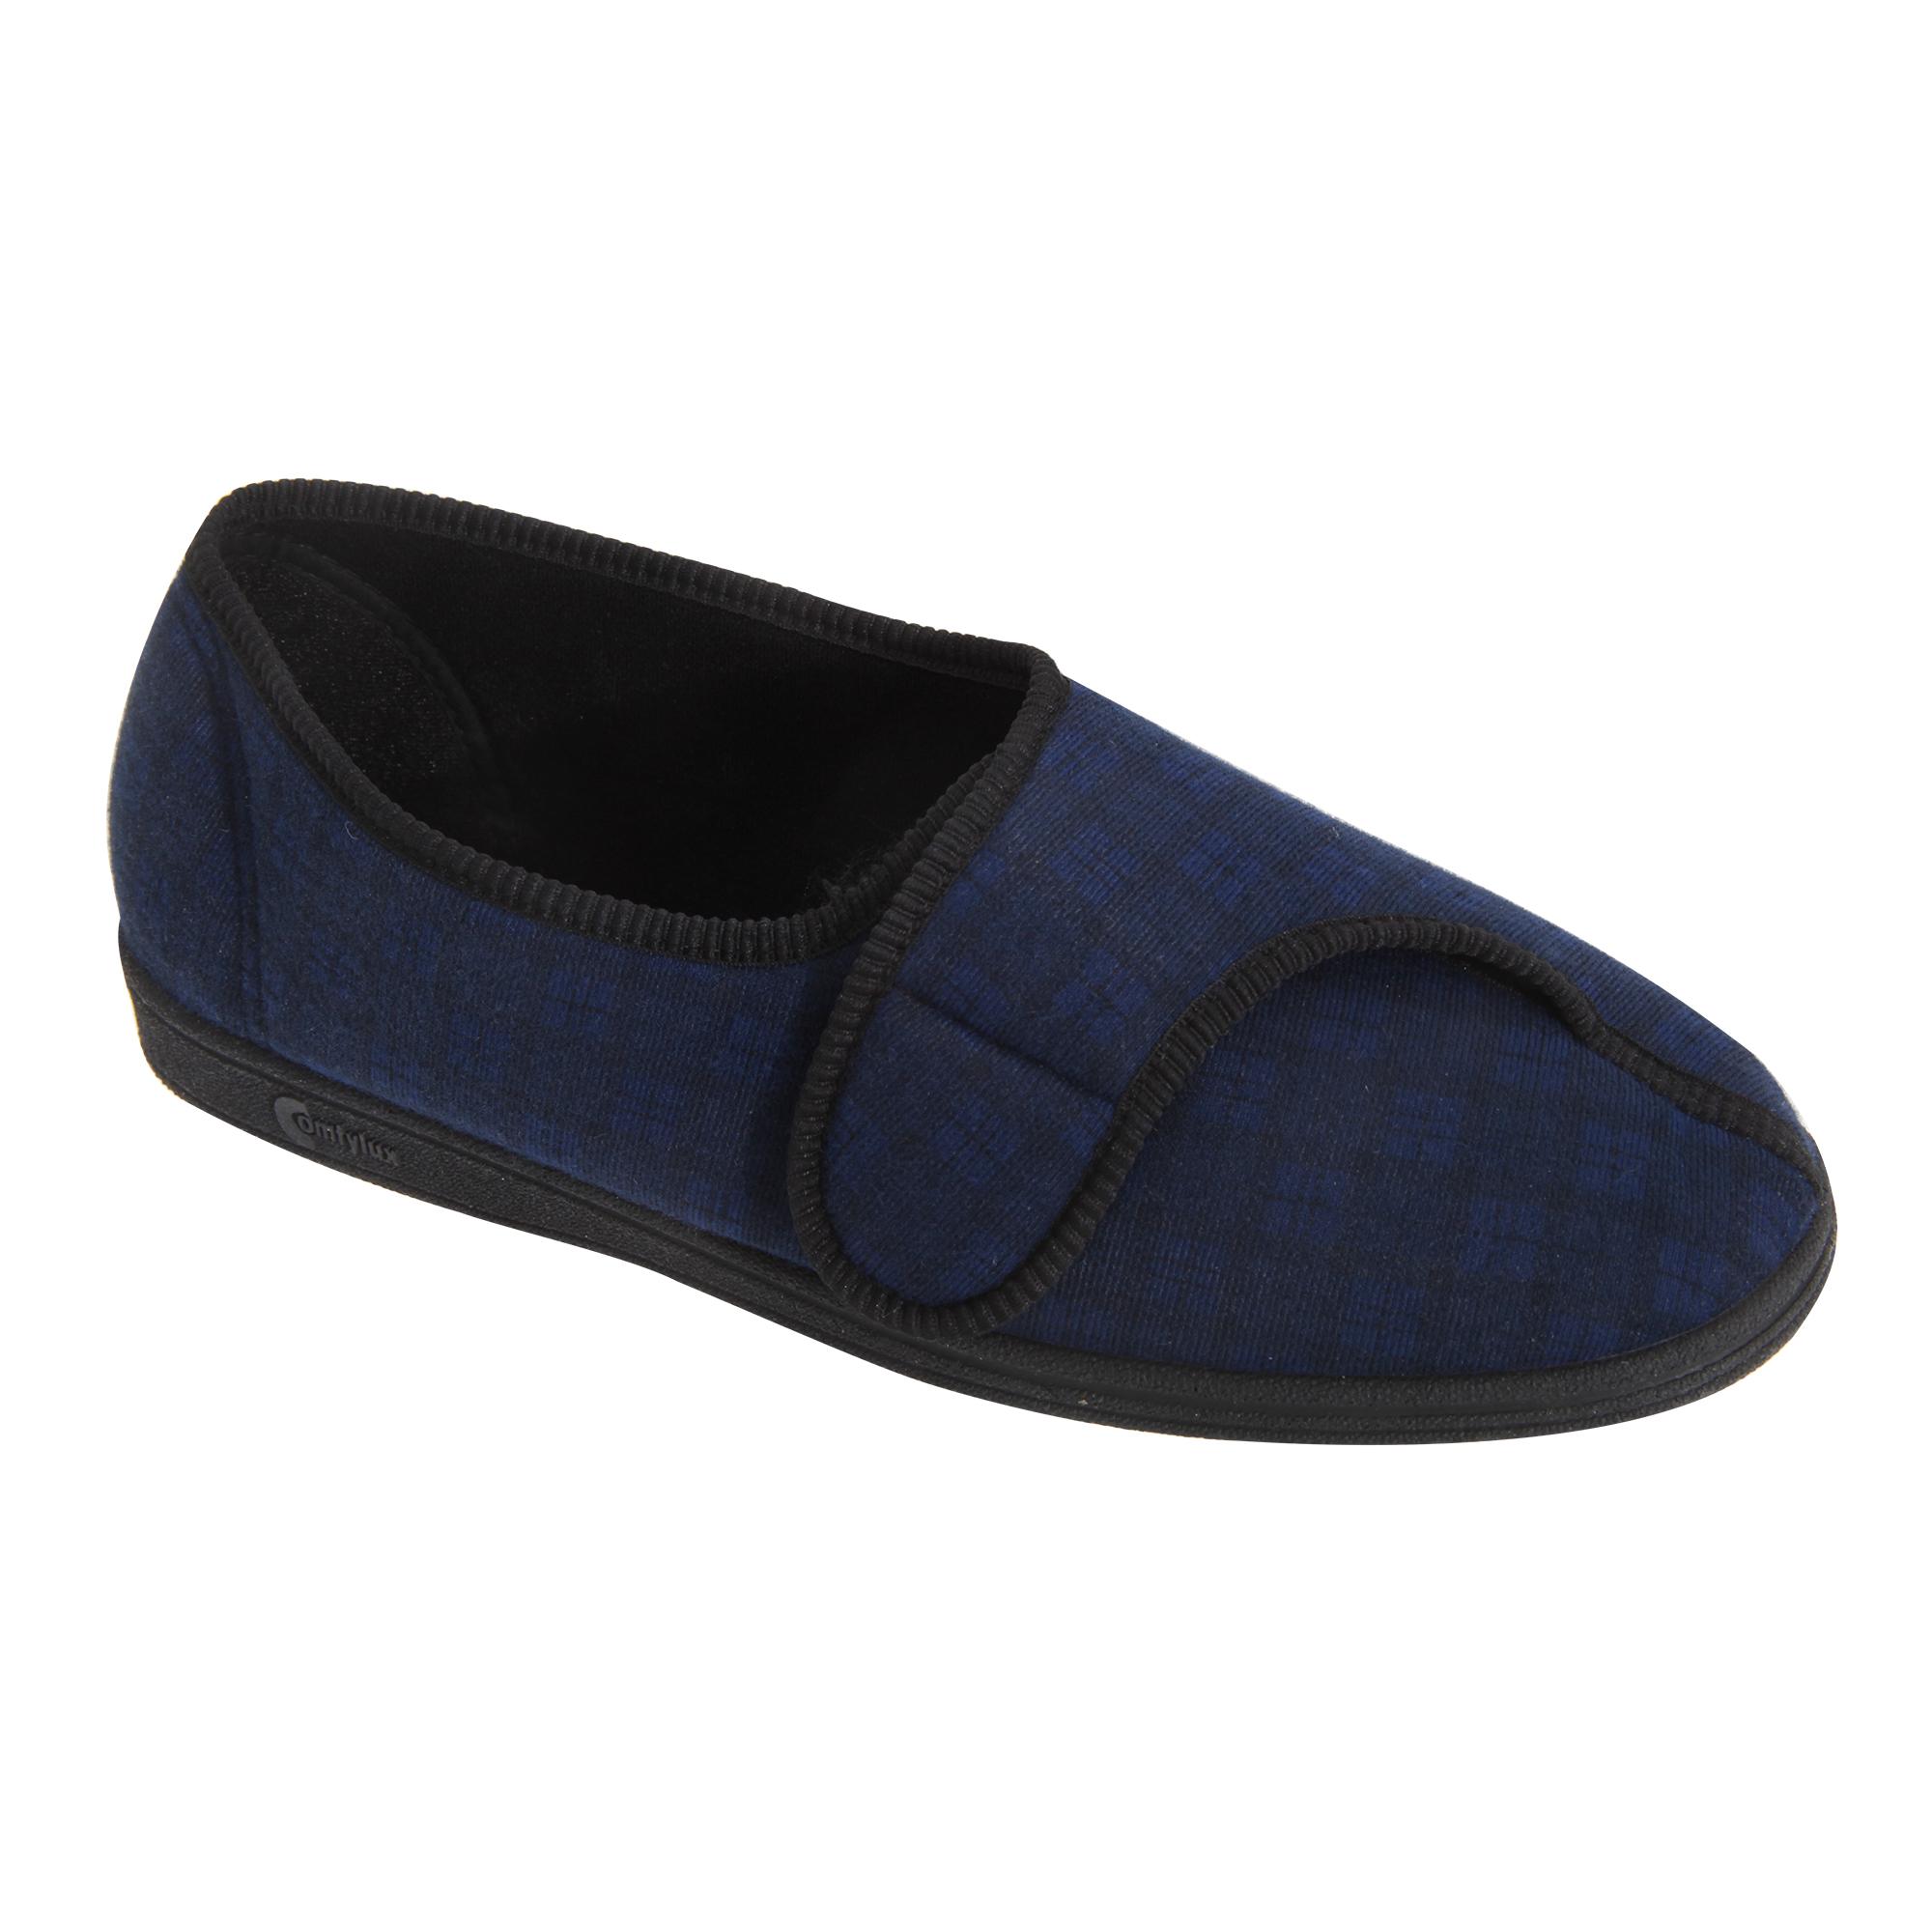 a23f5a8221c Comfylux Mens Paul Velcro Check Slippers 3 Colours 8 Sizes UK 6-13 ...